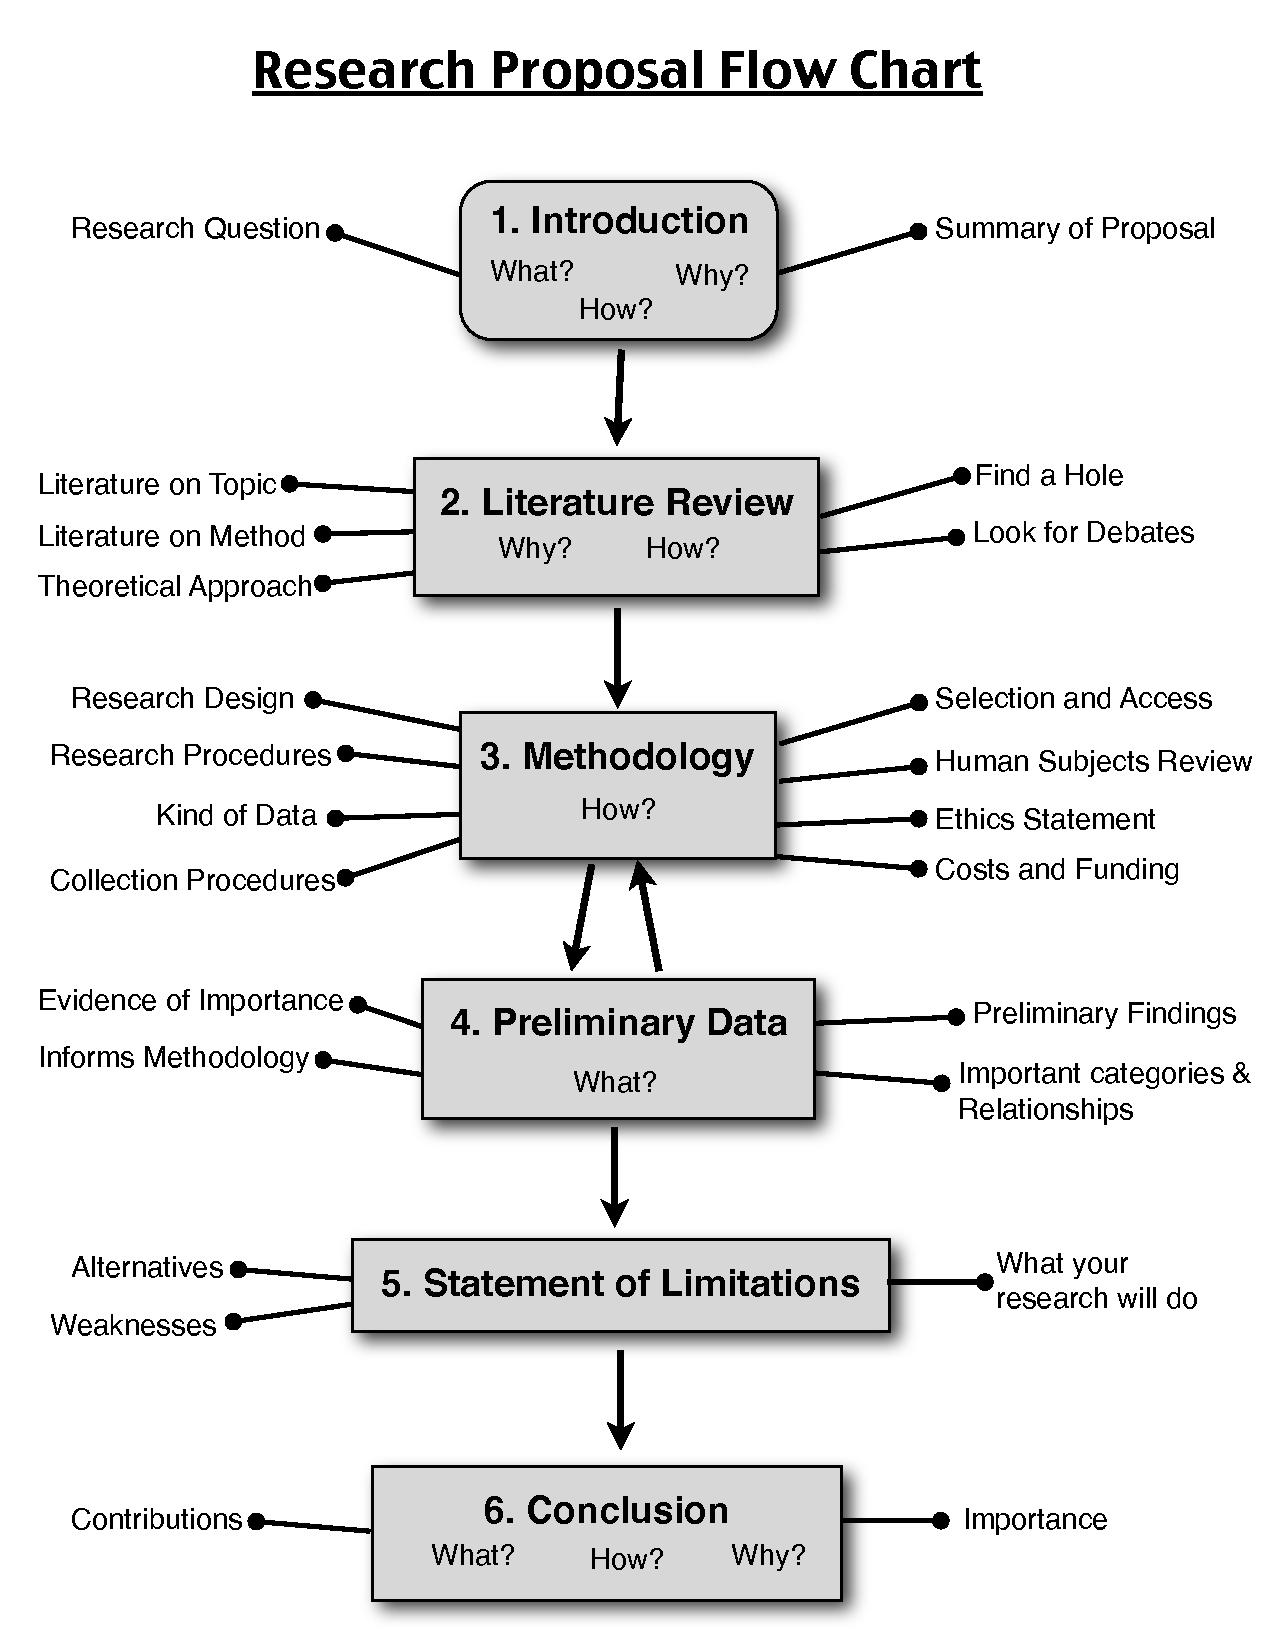 Research proposal flow chart school stuff pinterest proposals and also rh